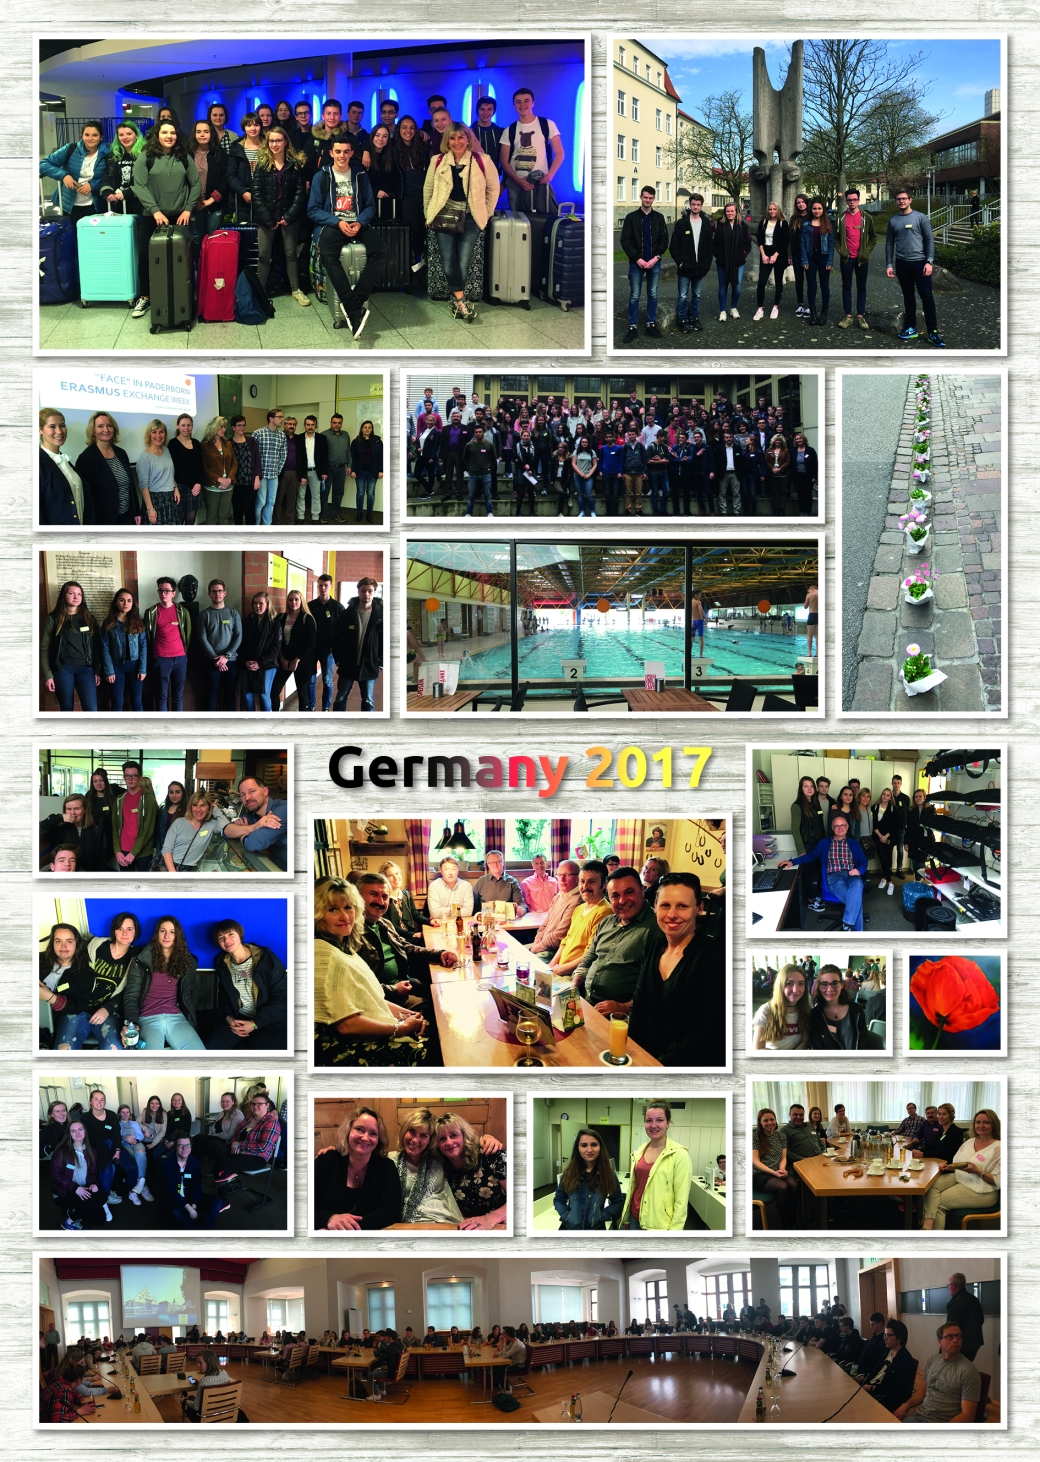 Germany-2017-1